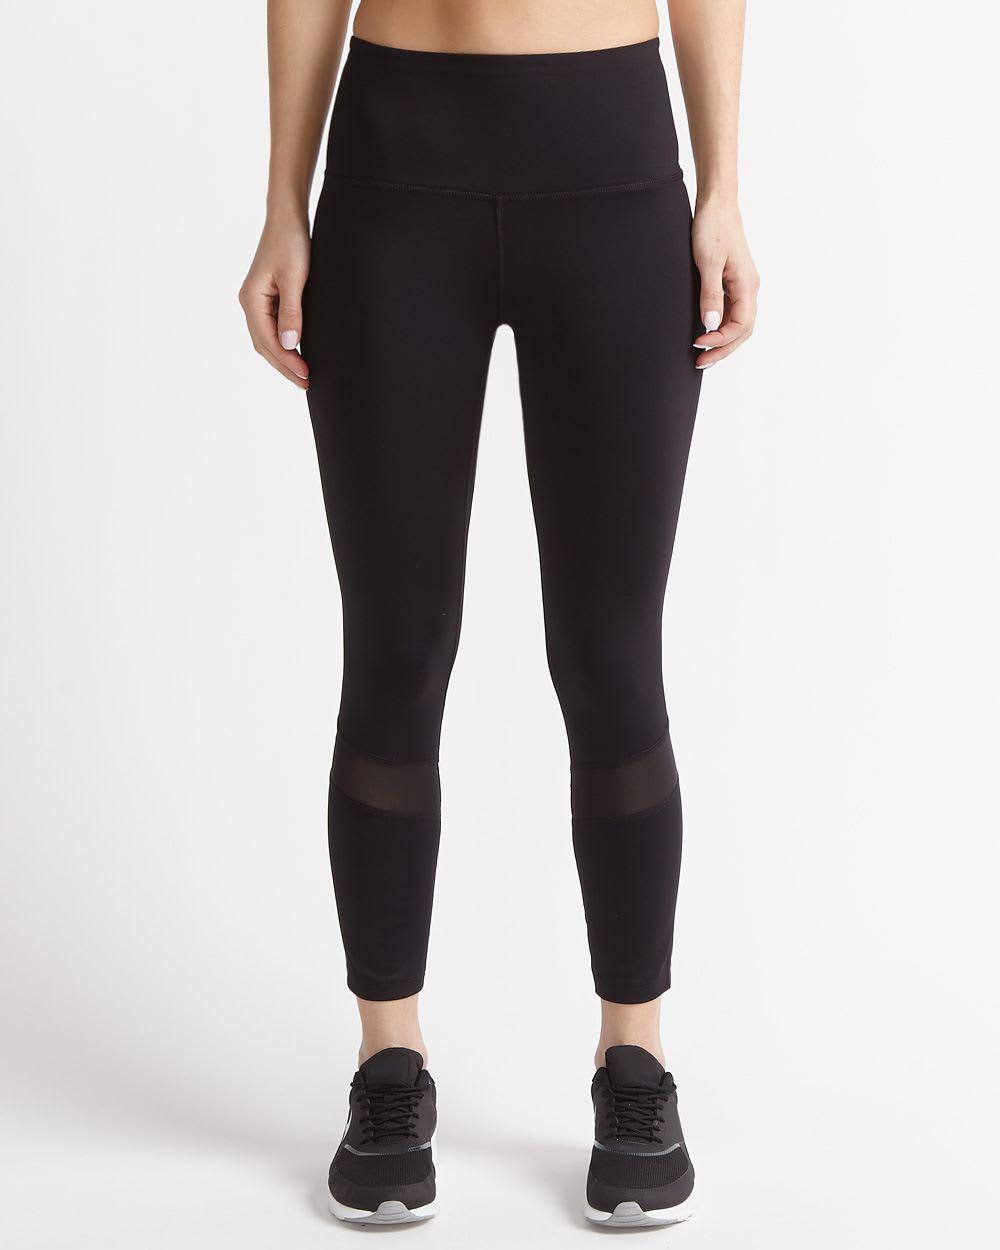 79e99130a5 Hyba Compression Cropped Legging | Women | Reitmans